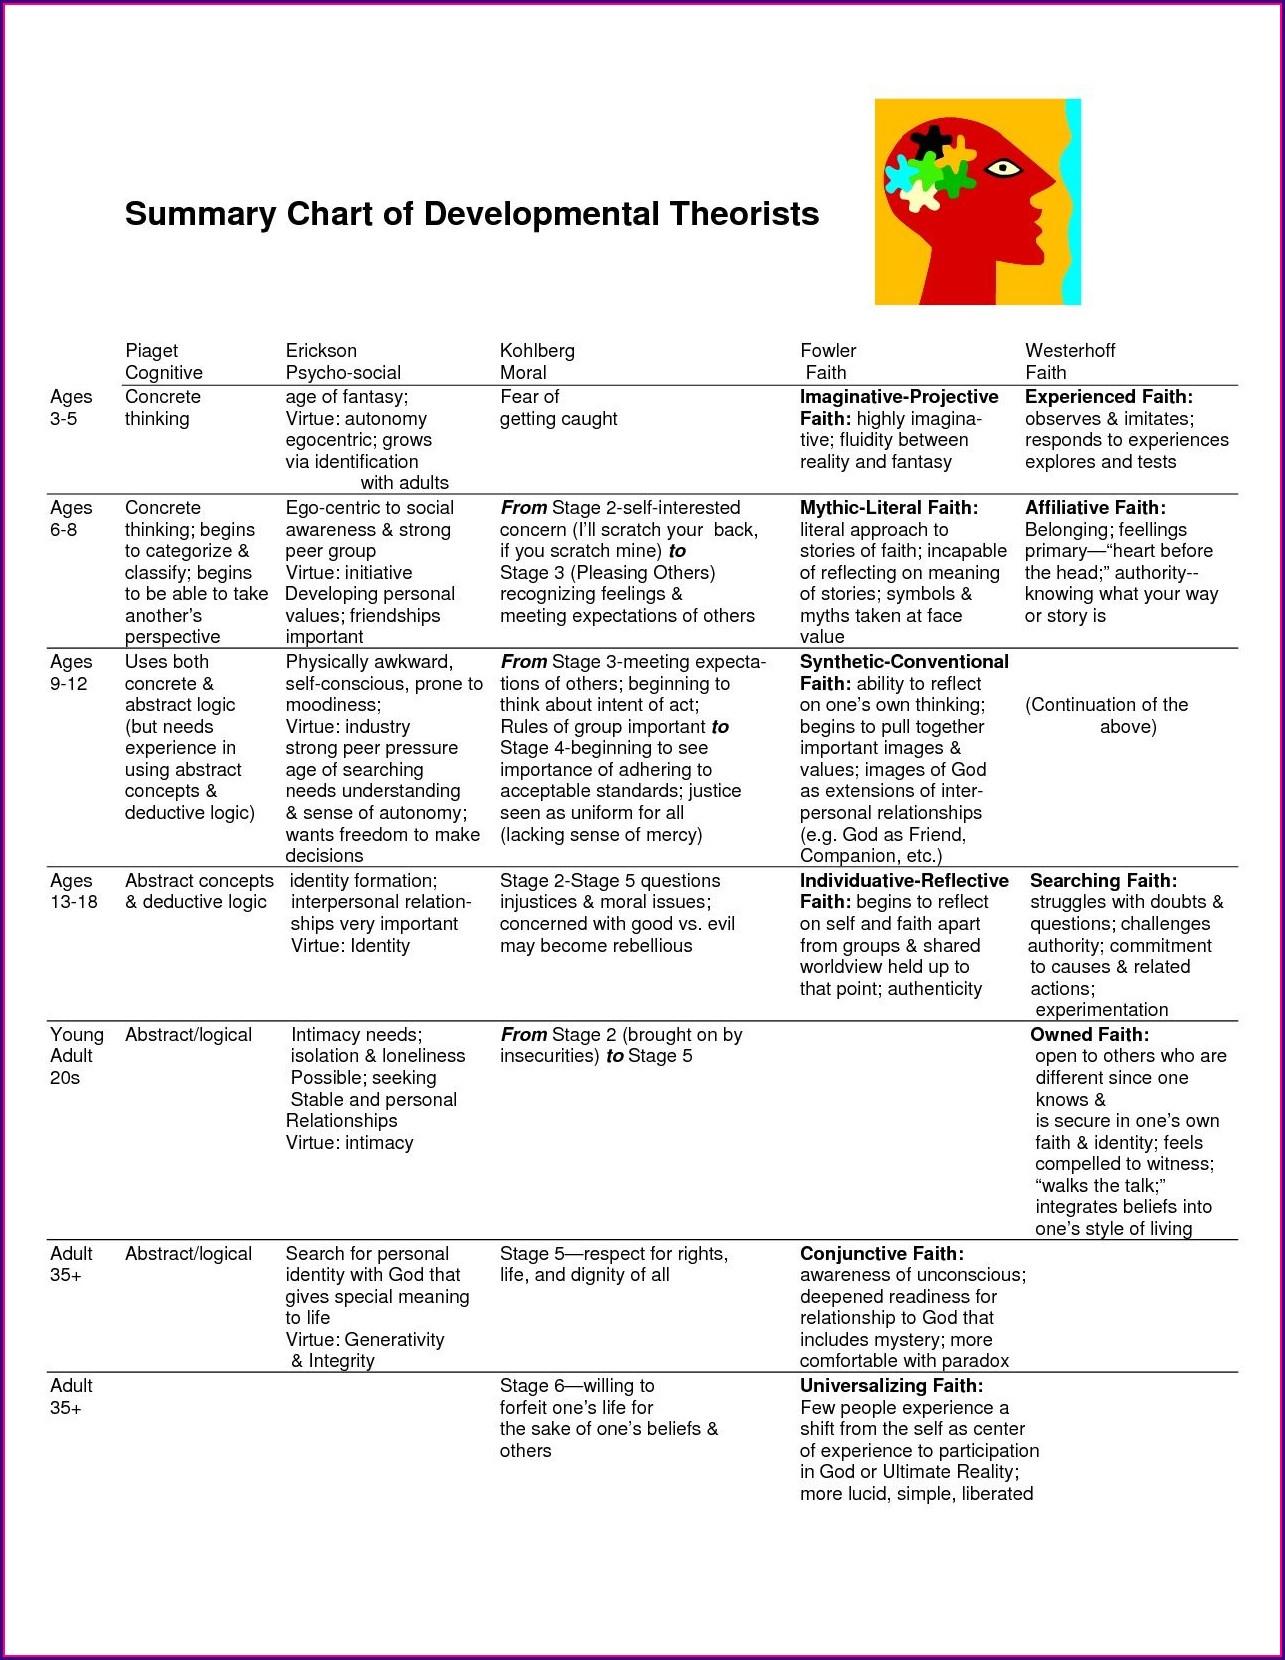 Child Development Theorists Worksheet Answers